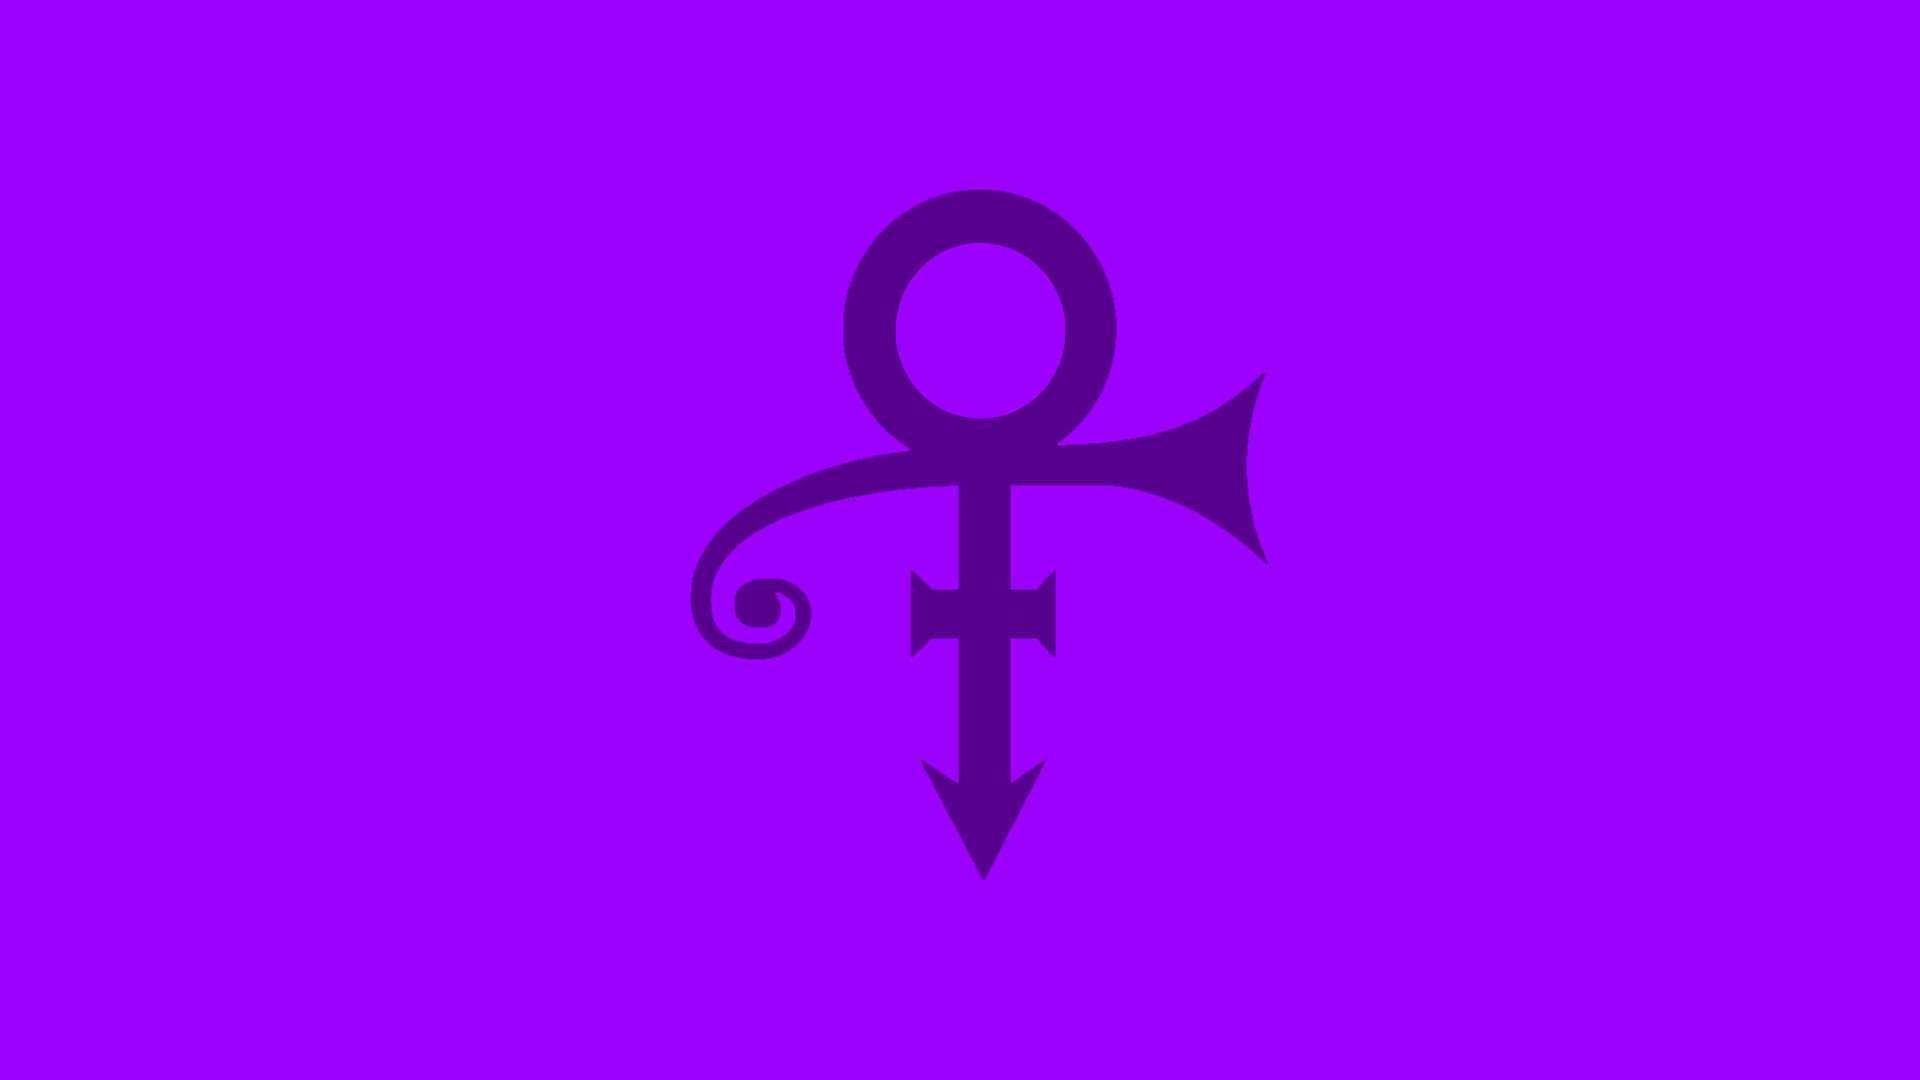 Prince Symbol Wallpaper 58 Images